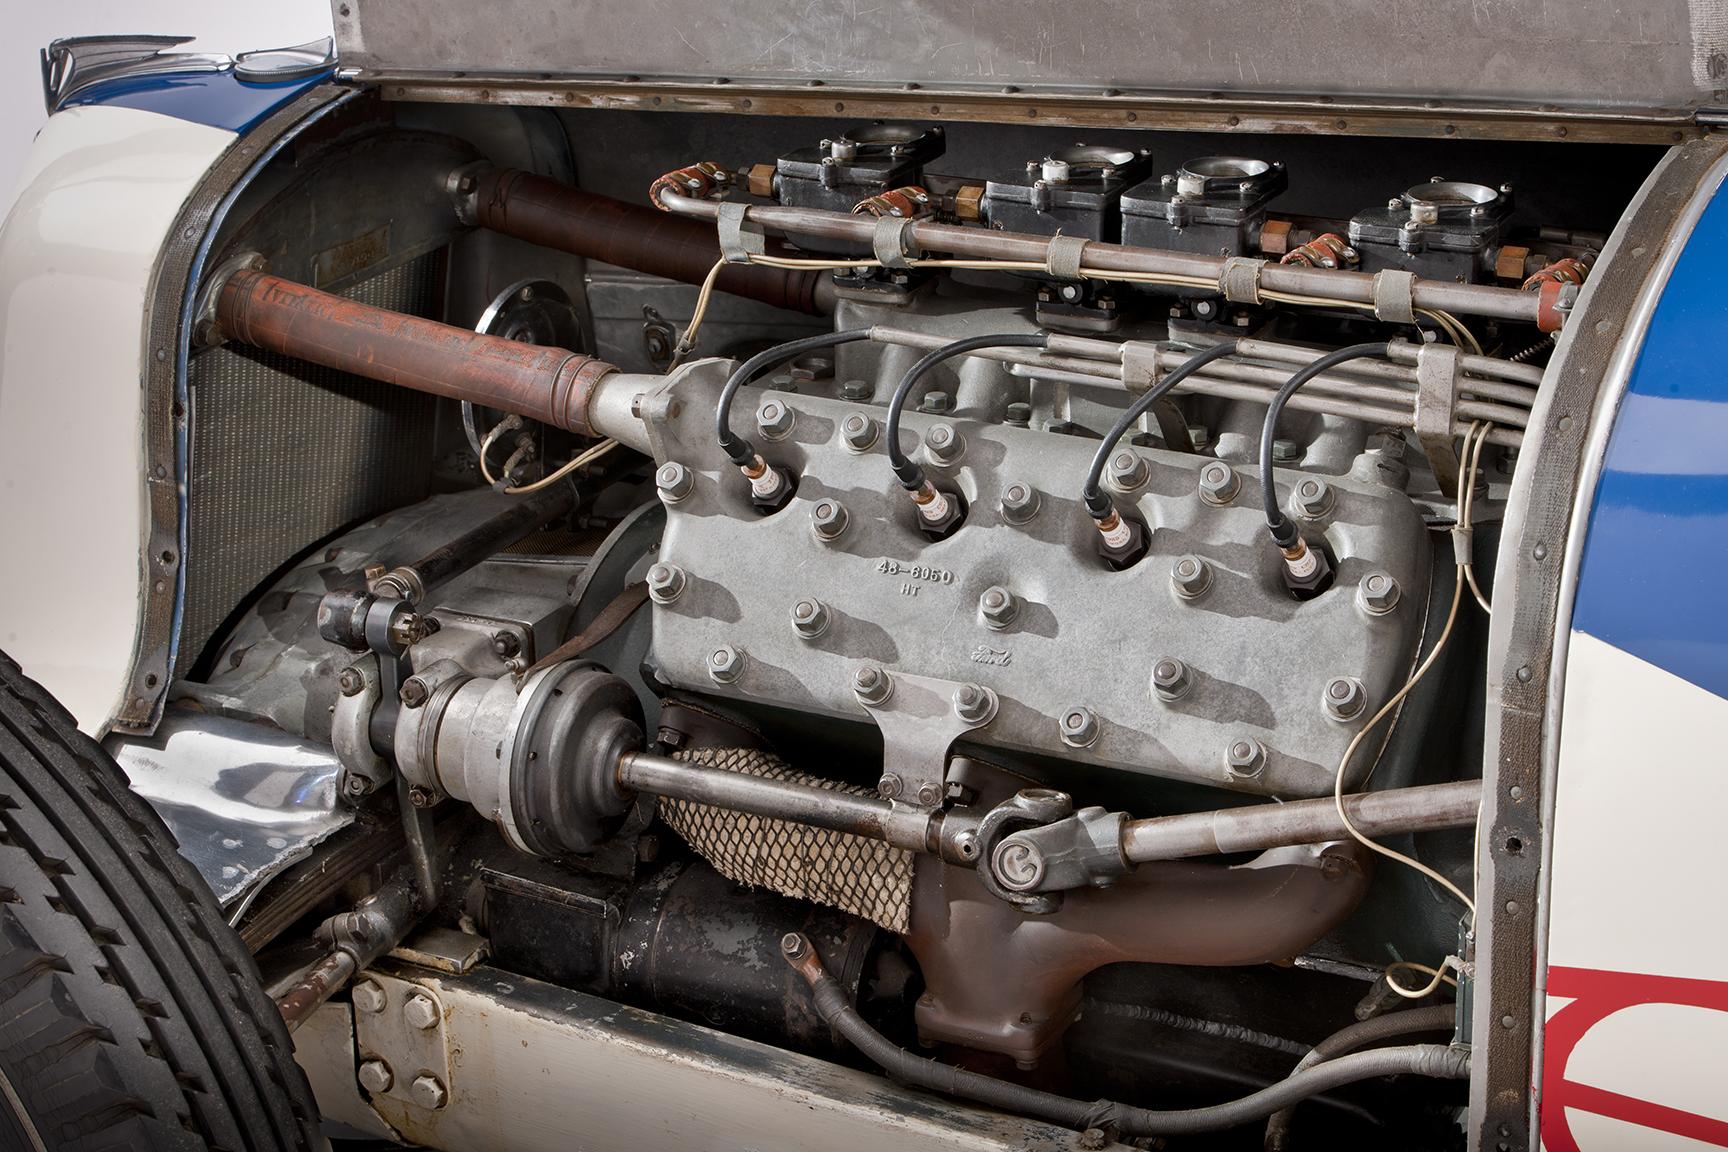 1935 Ford-Miller Special engine